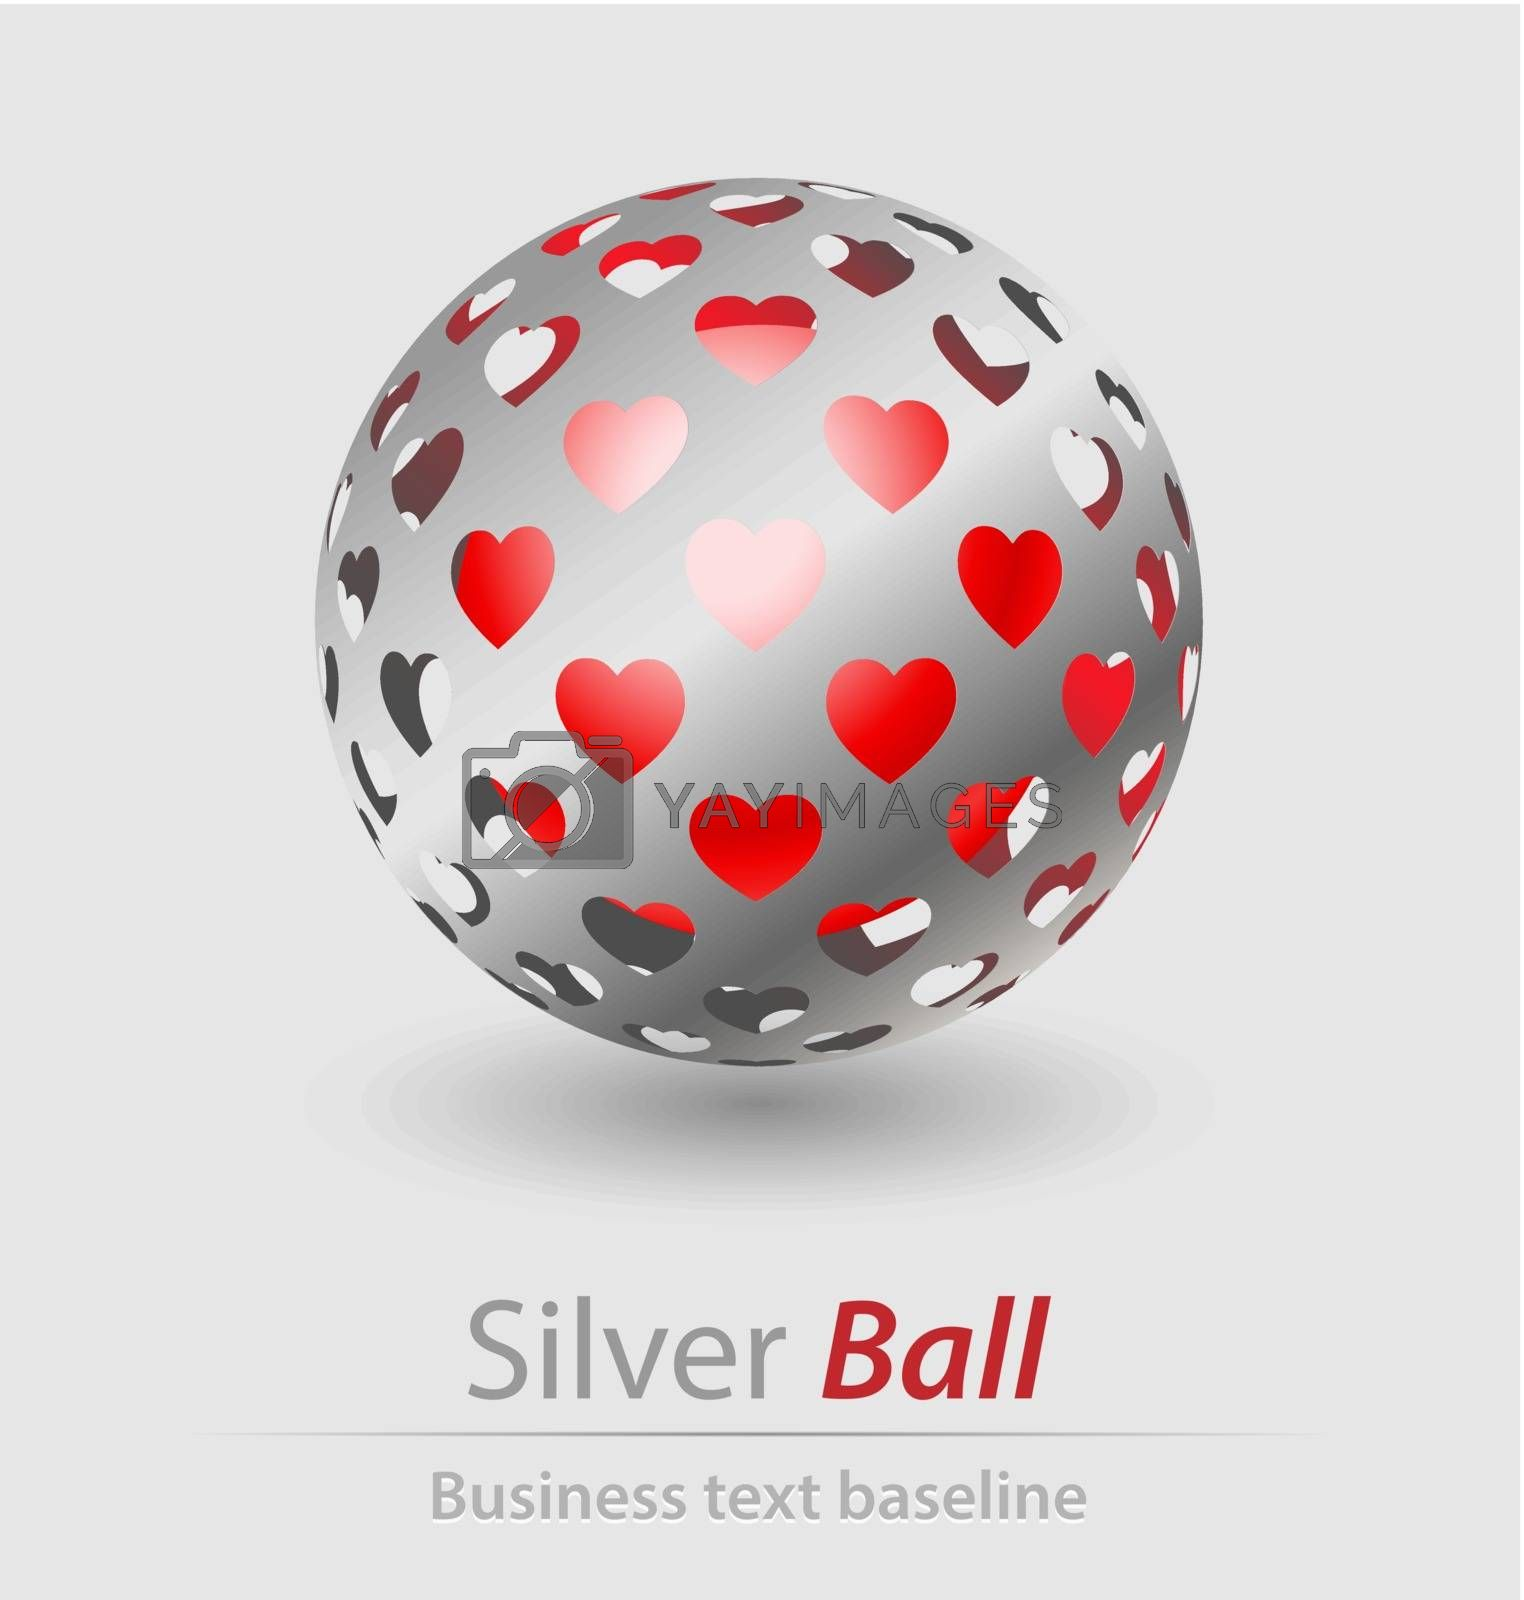 Silver ball elegant icon for creative design tasks